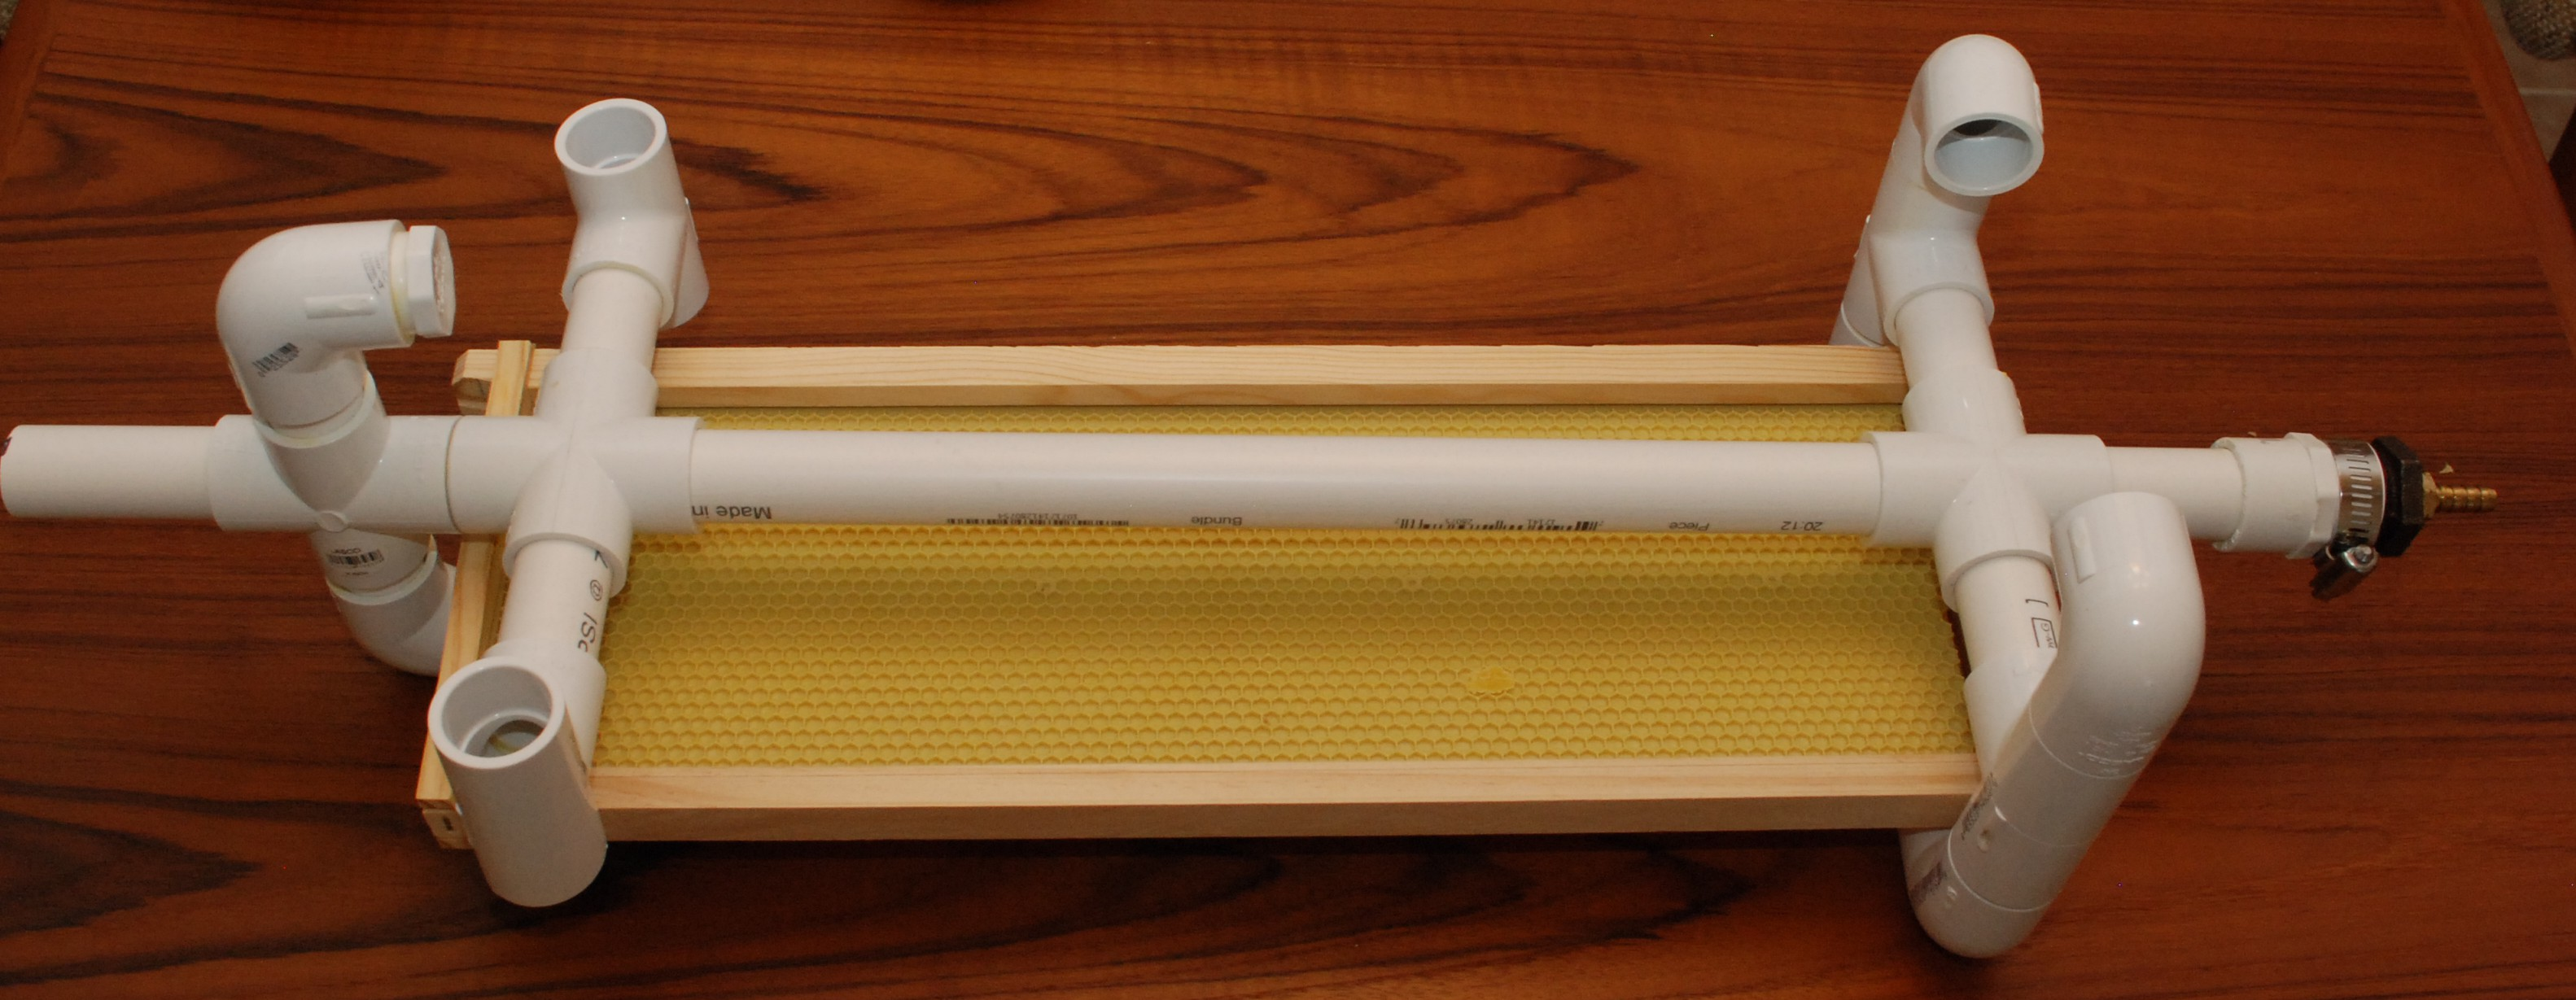 Diy Drill Powered Honey Spinner Kilted Craft Works